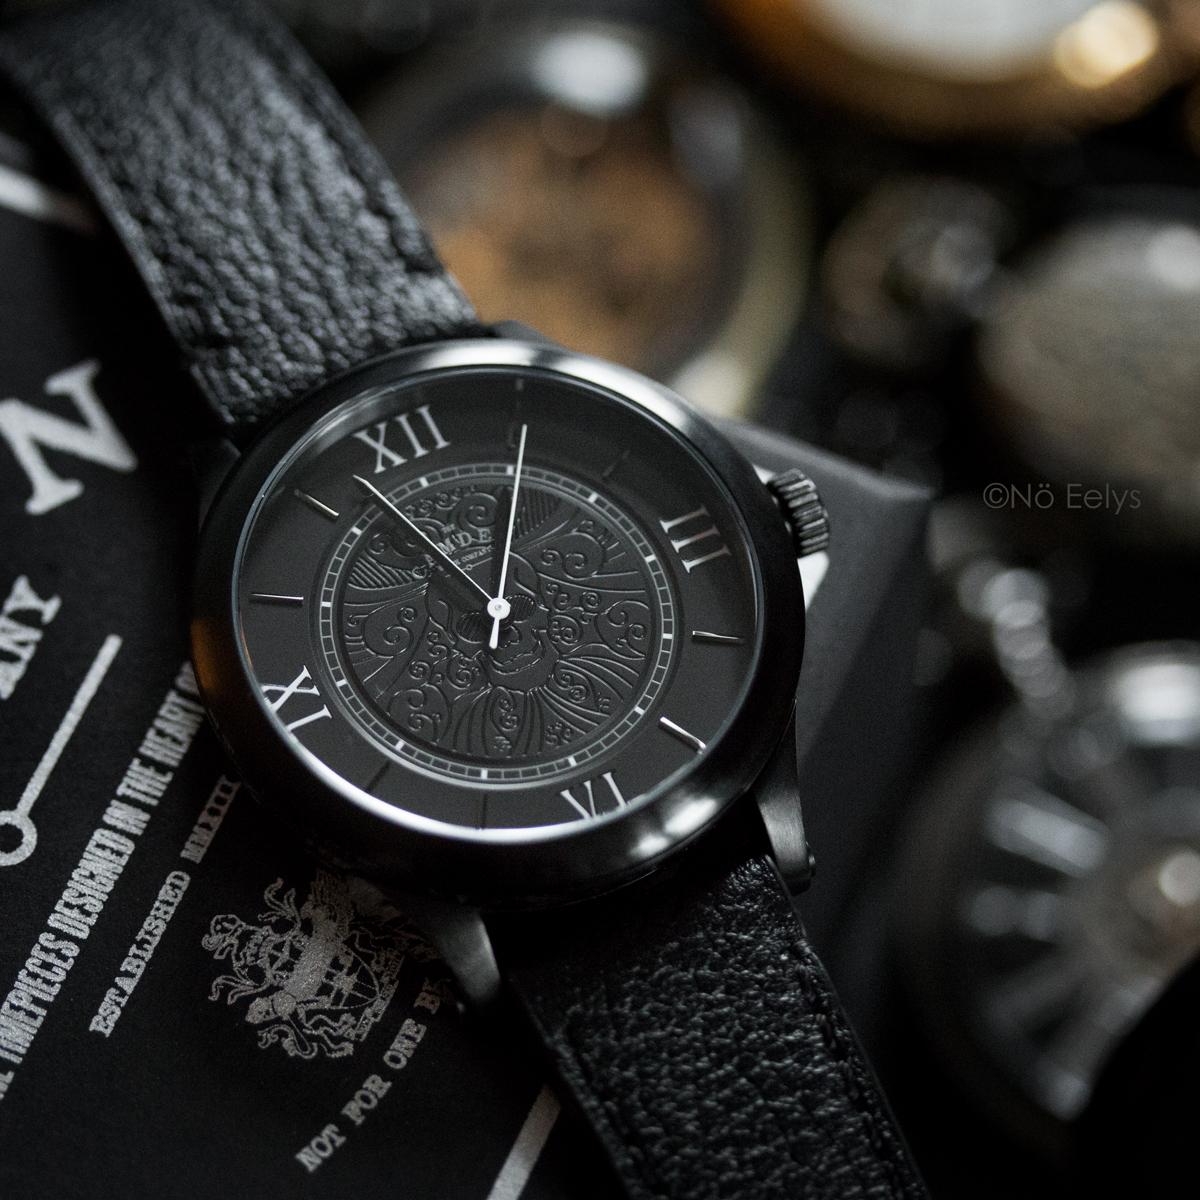 GIVEAWAY Montre gothique victorienne Memento Mori The Camden Watch company